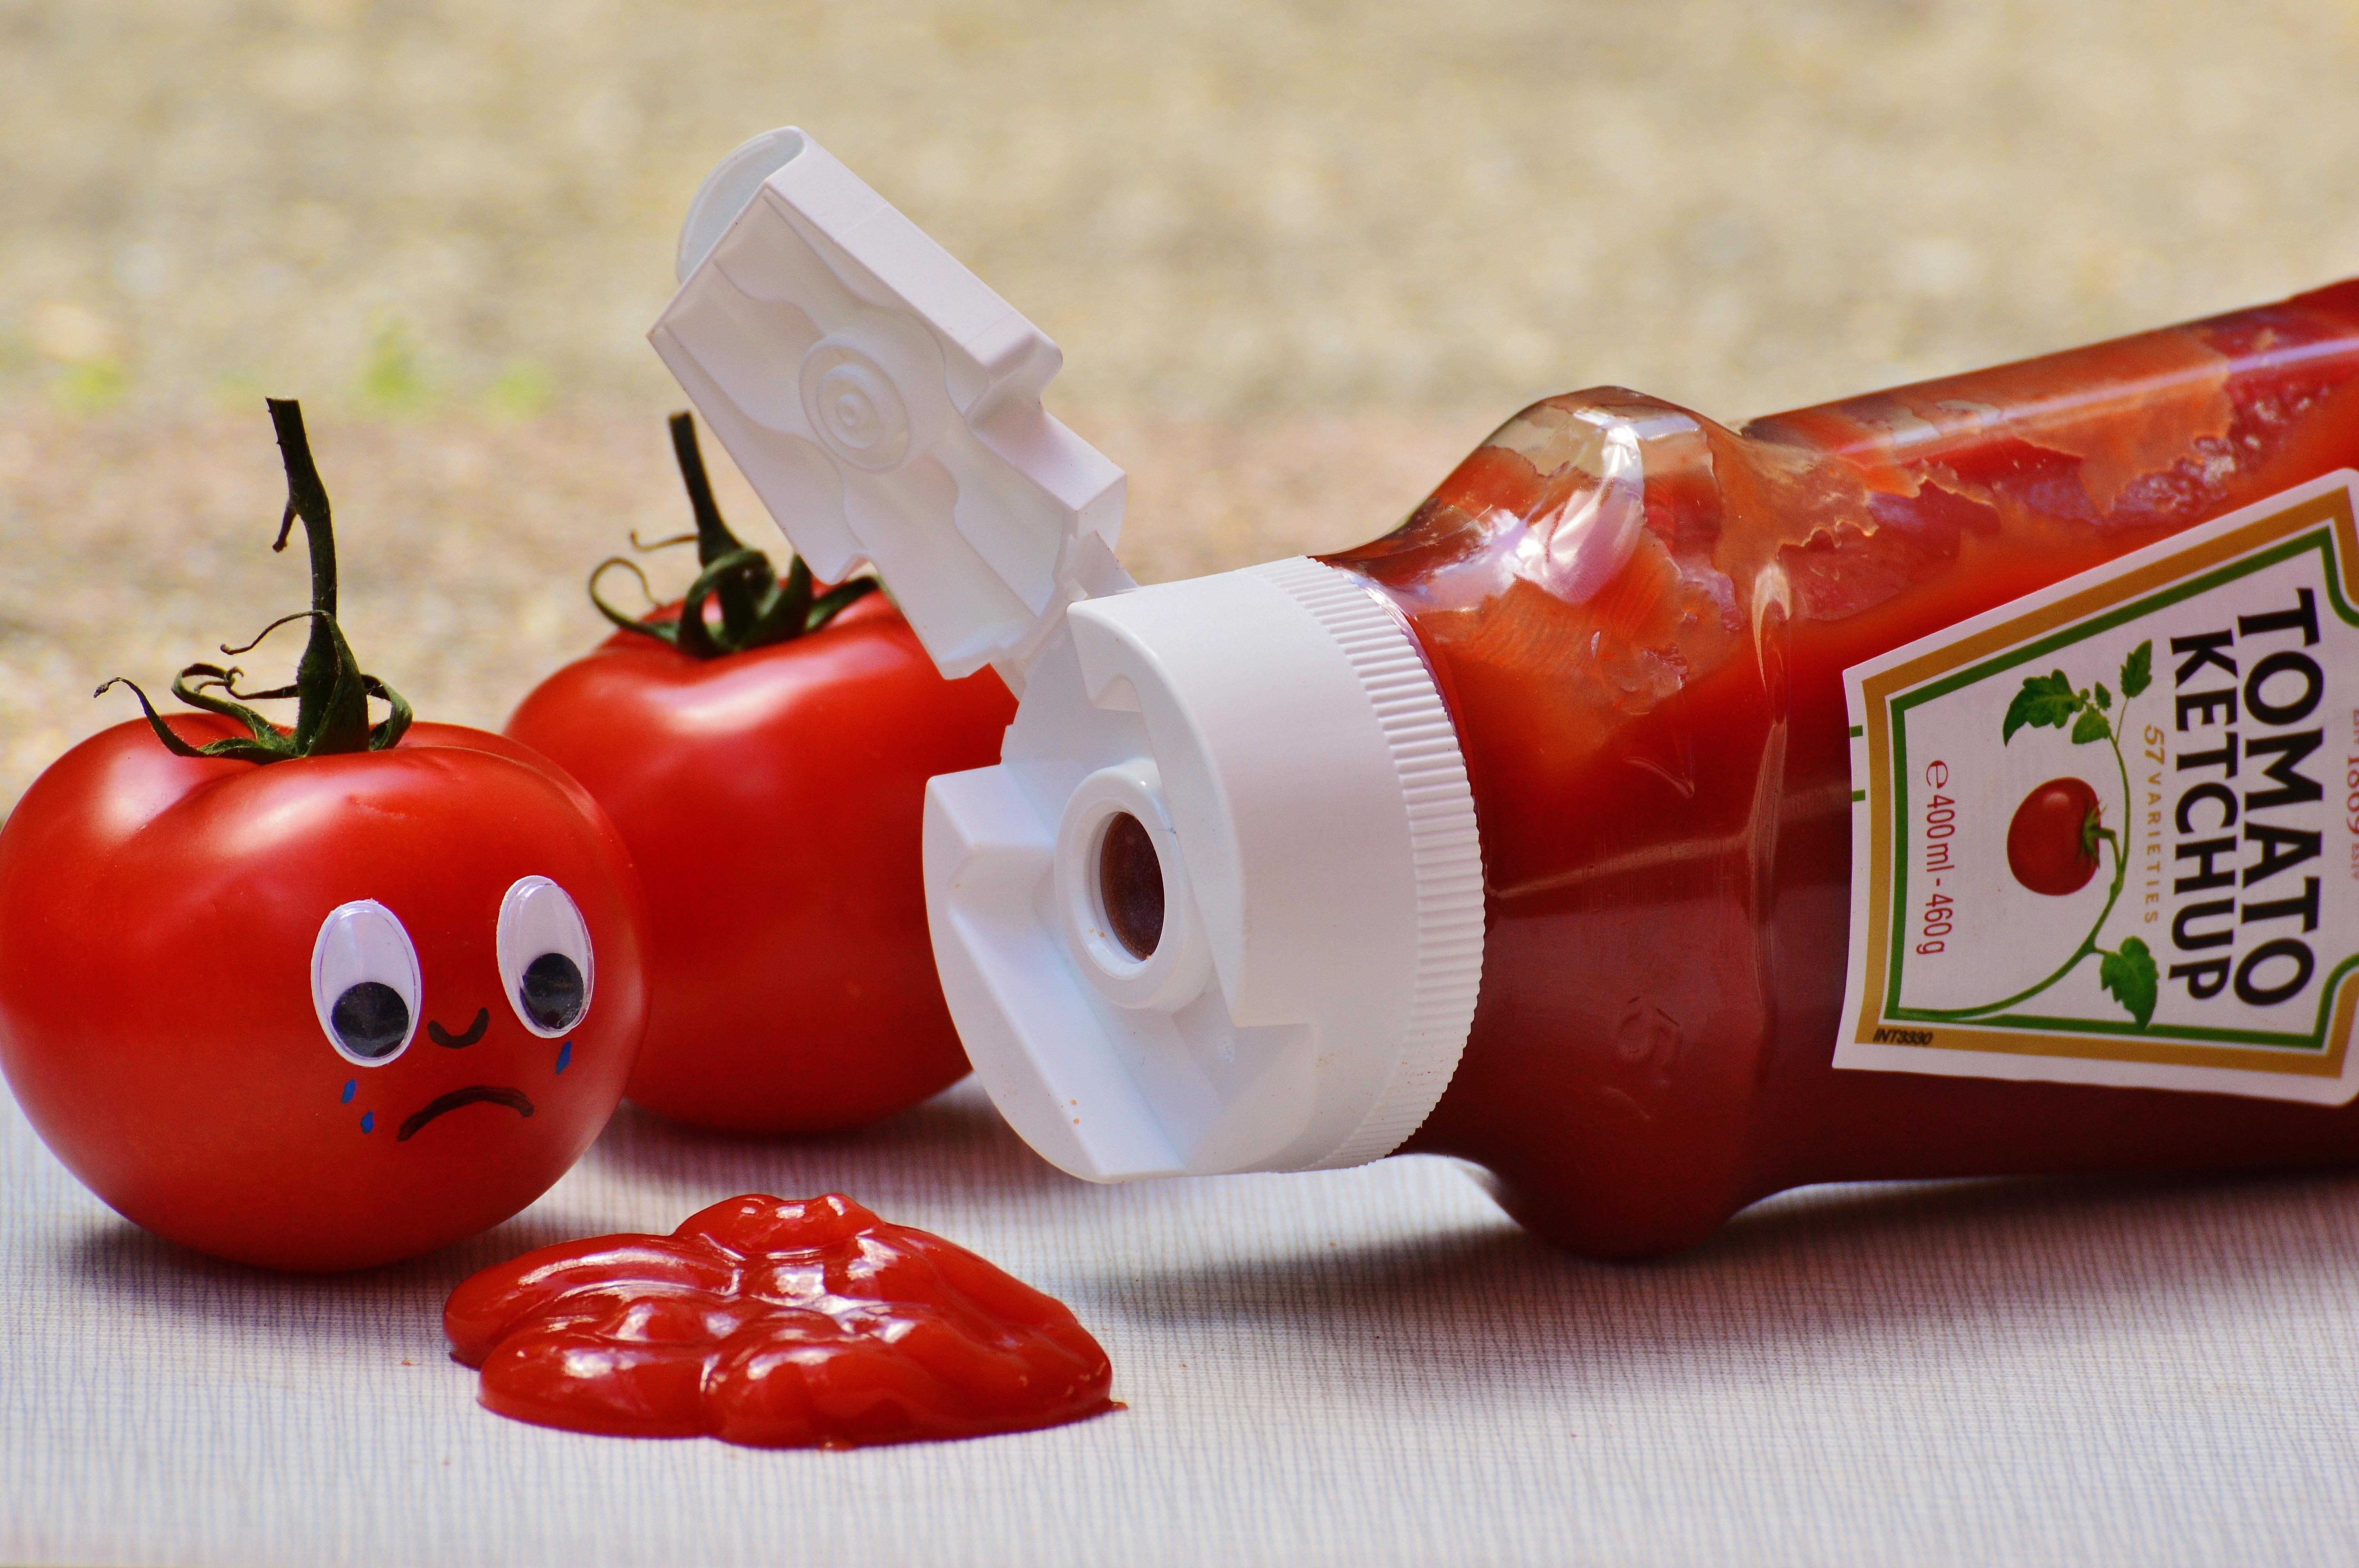 The Ketchup Transformation